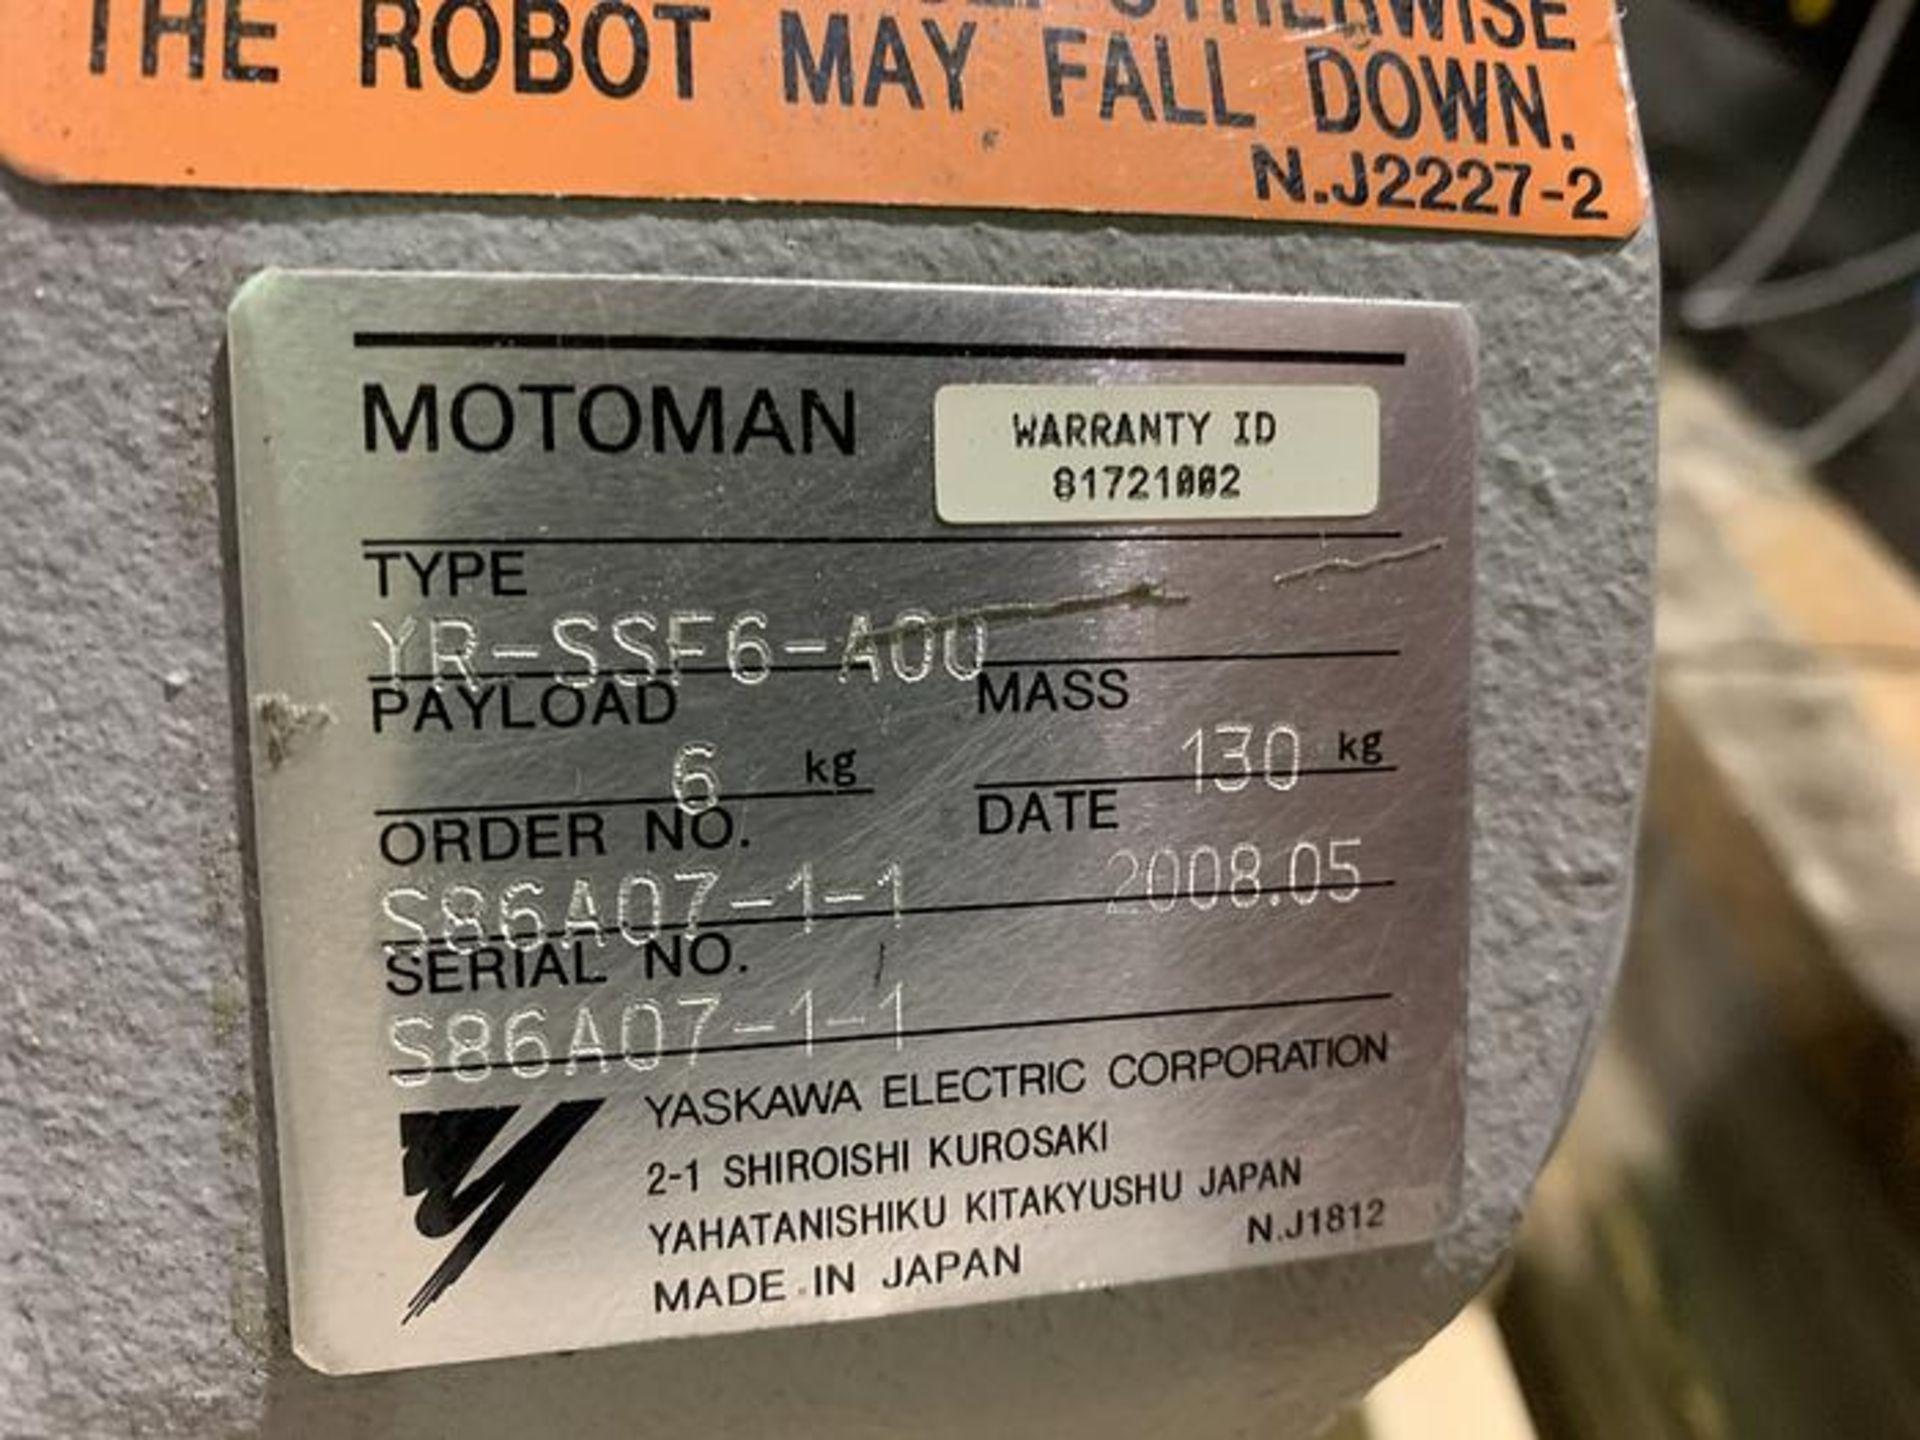 Lot 57 - MOTOMAN ROBOT SSF2000 6 KG X 1,378mm REACH 6 AXIS, W/ NX100 CONTROL, YEAR 2008, SN S86AO7-1-1